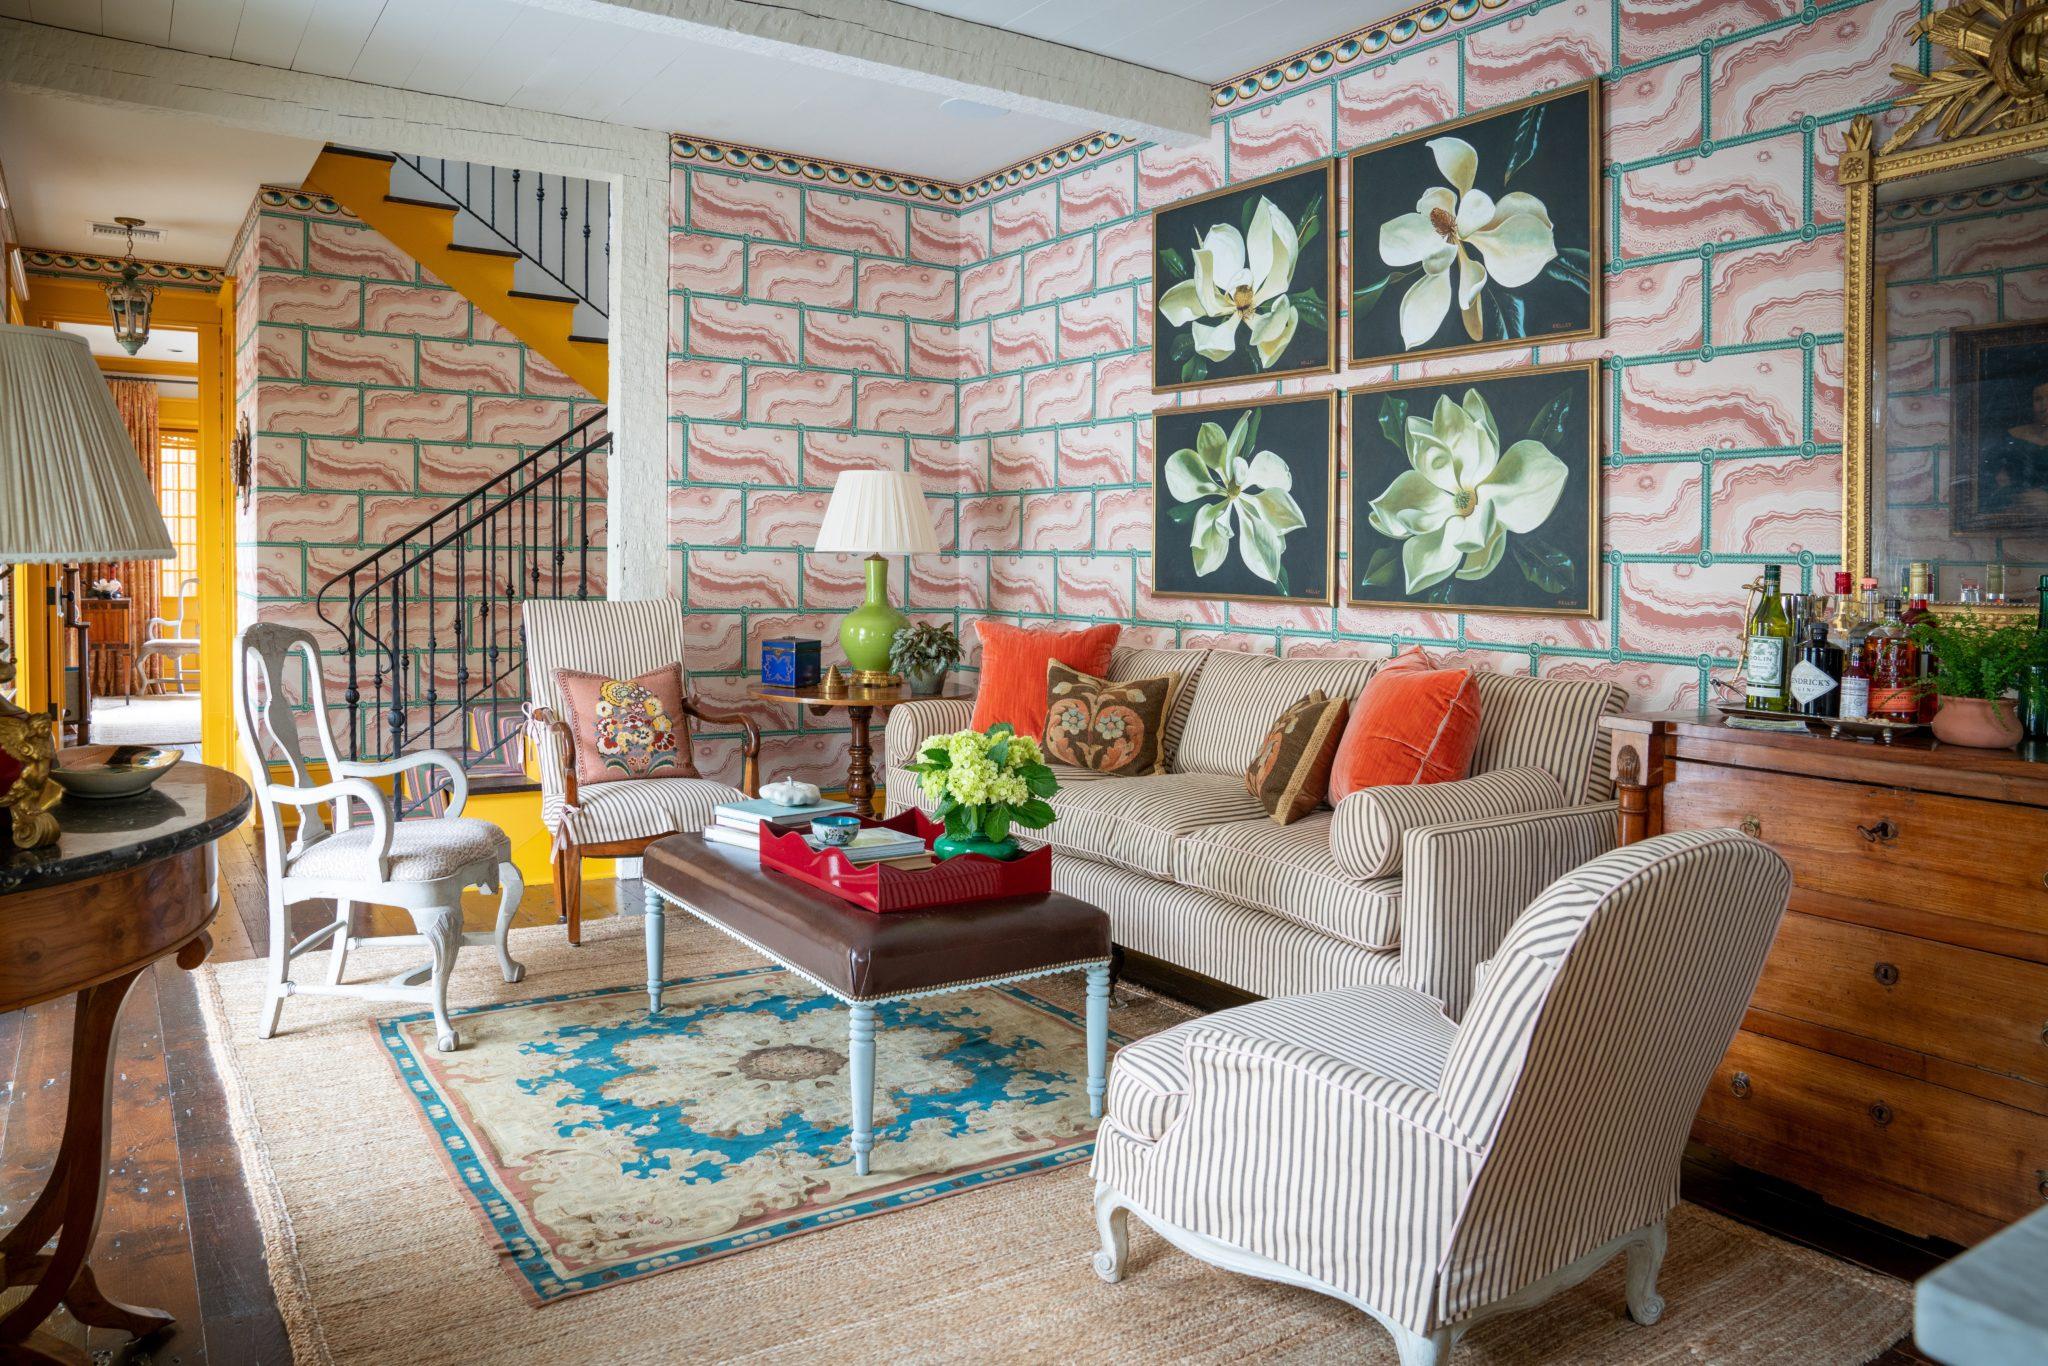 French Quarter Carriage House: Living Room by Brockschmidt & Coleman, LLC